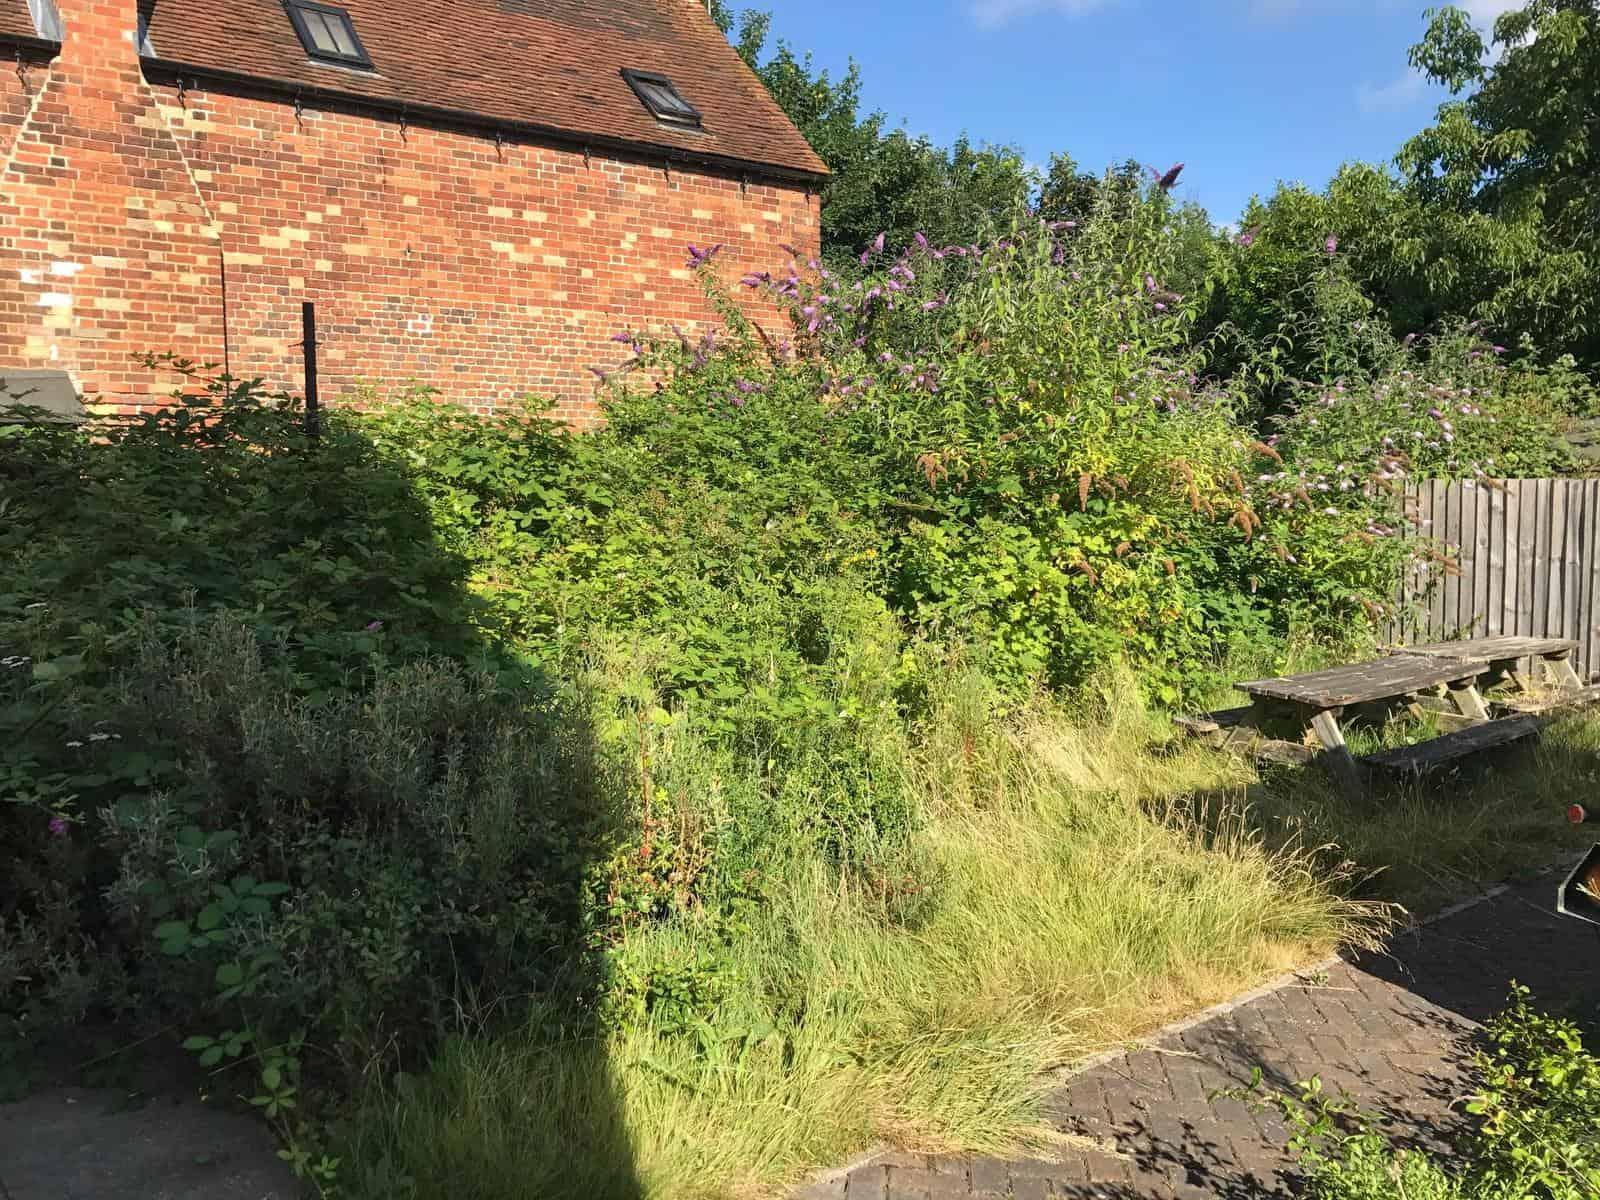 Brambles - garden tidy up